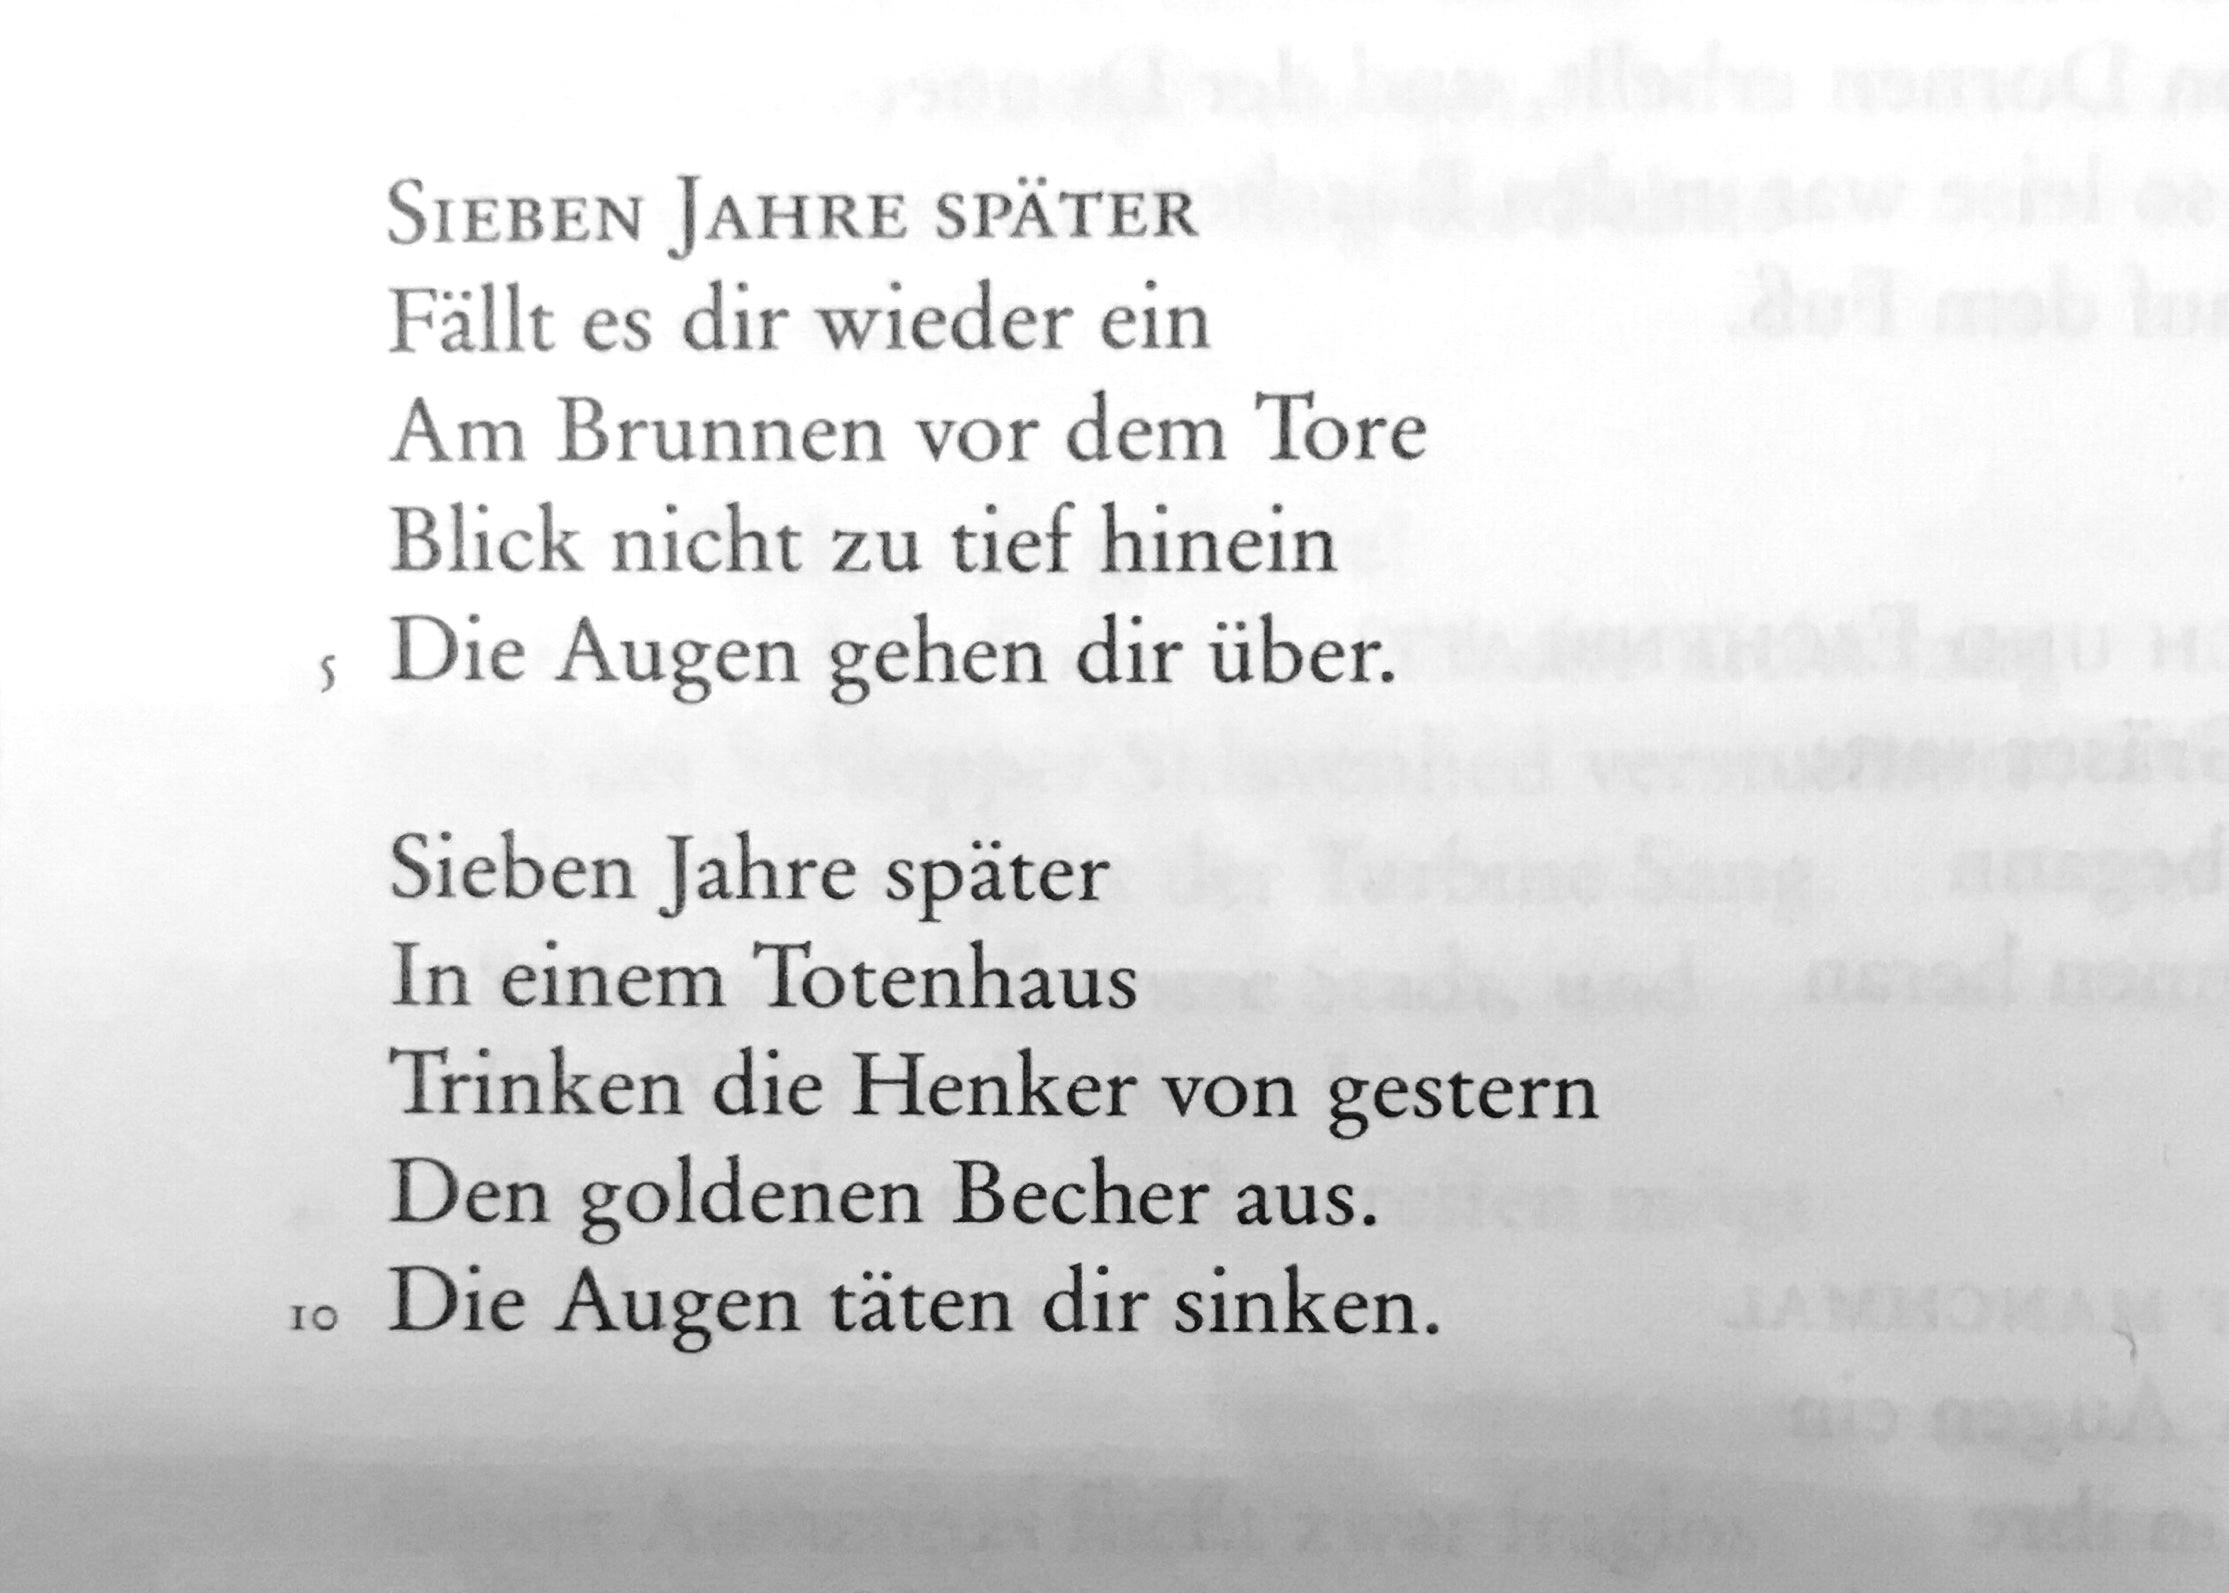 Brecht gedicht moldau